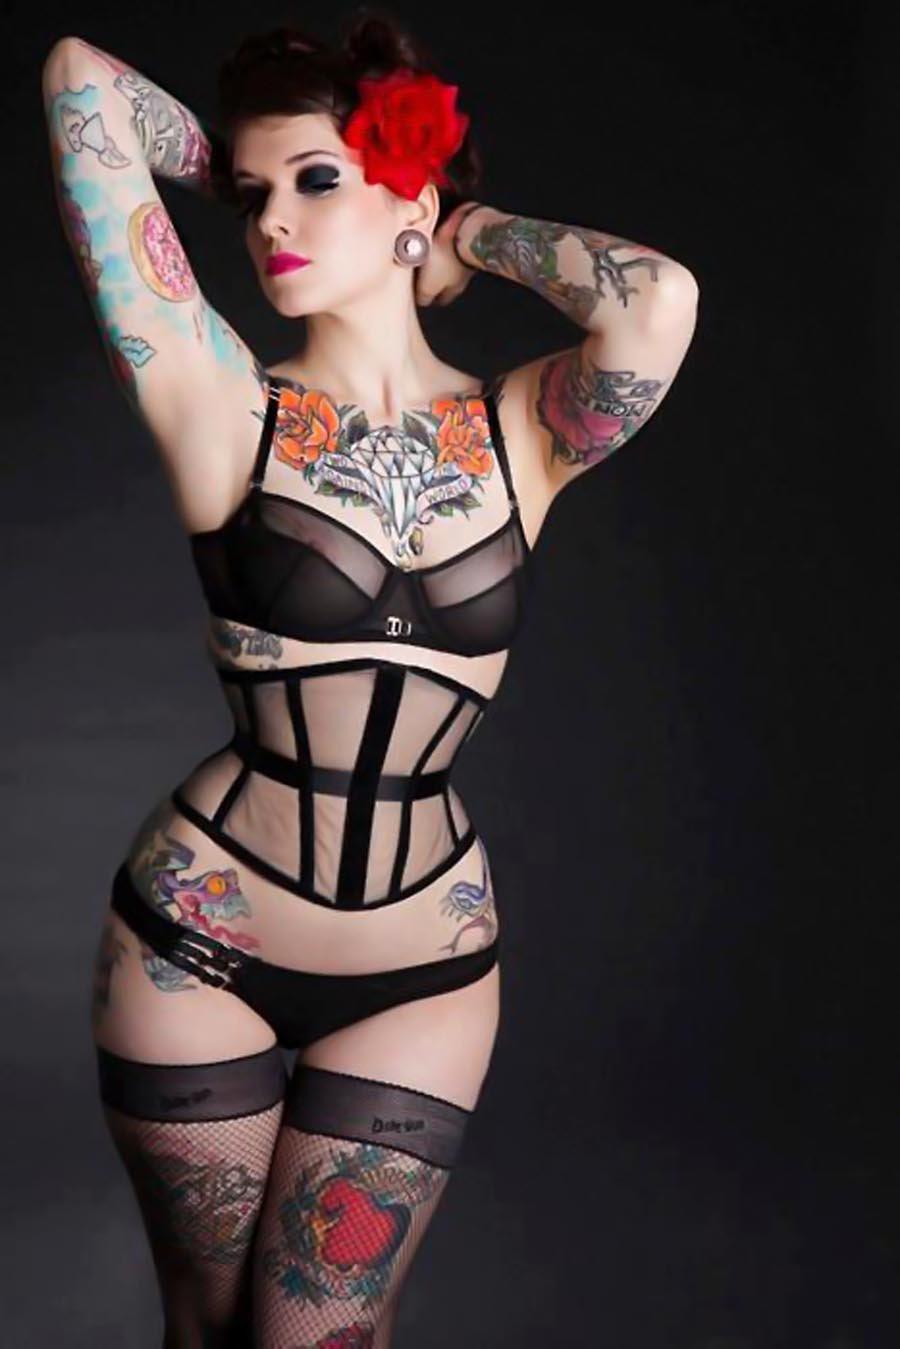 Female pin up sexy tattoo